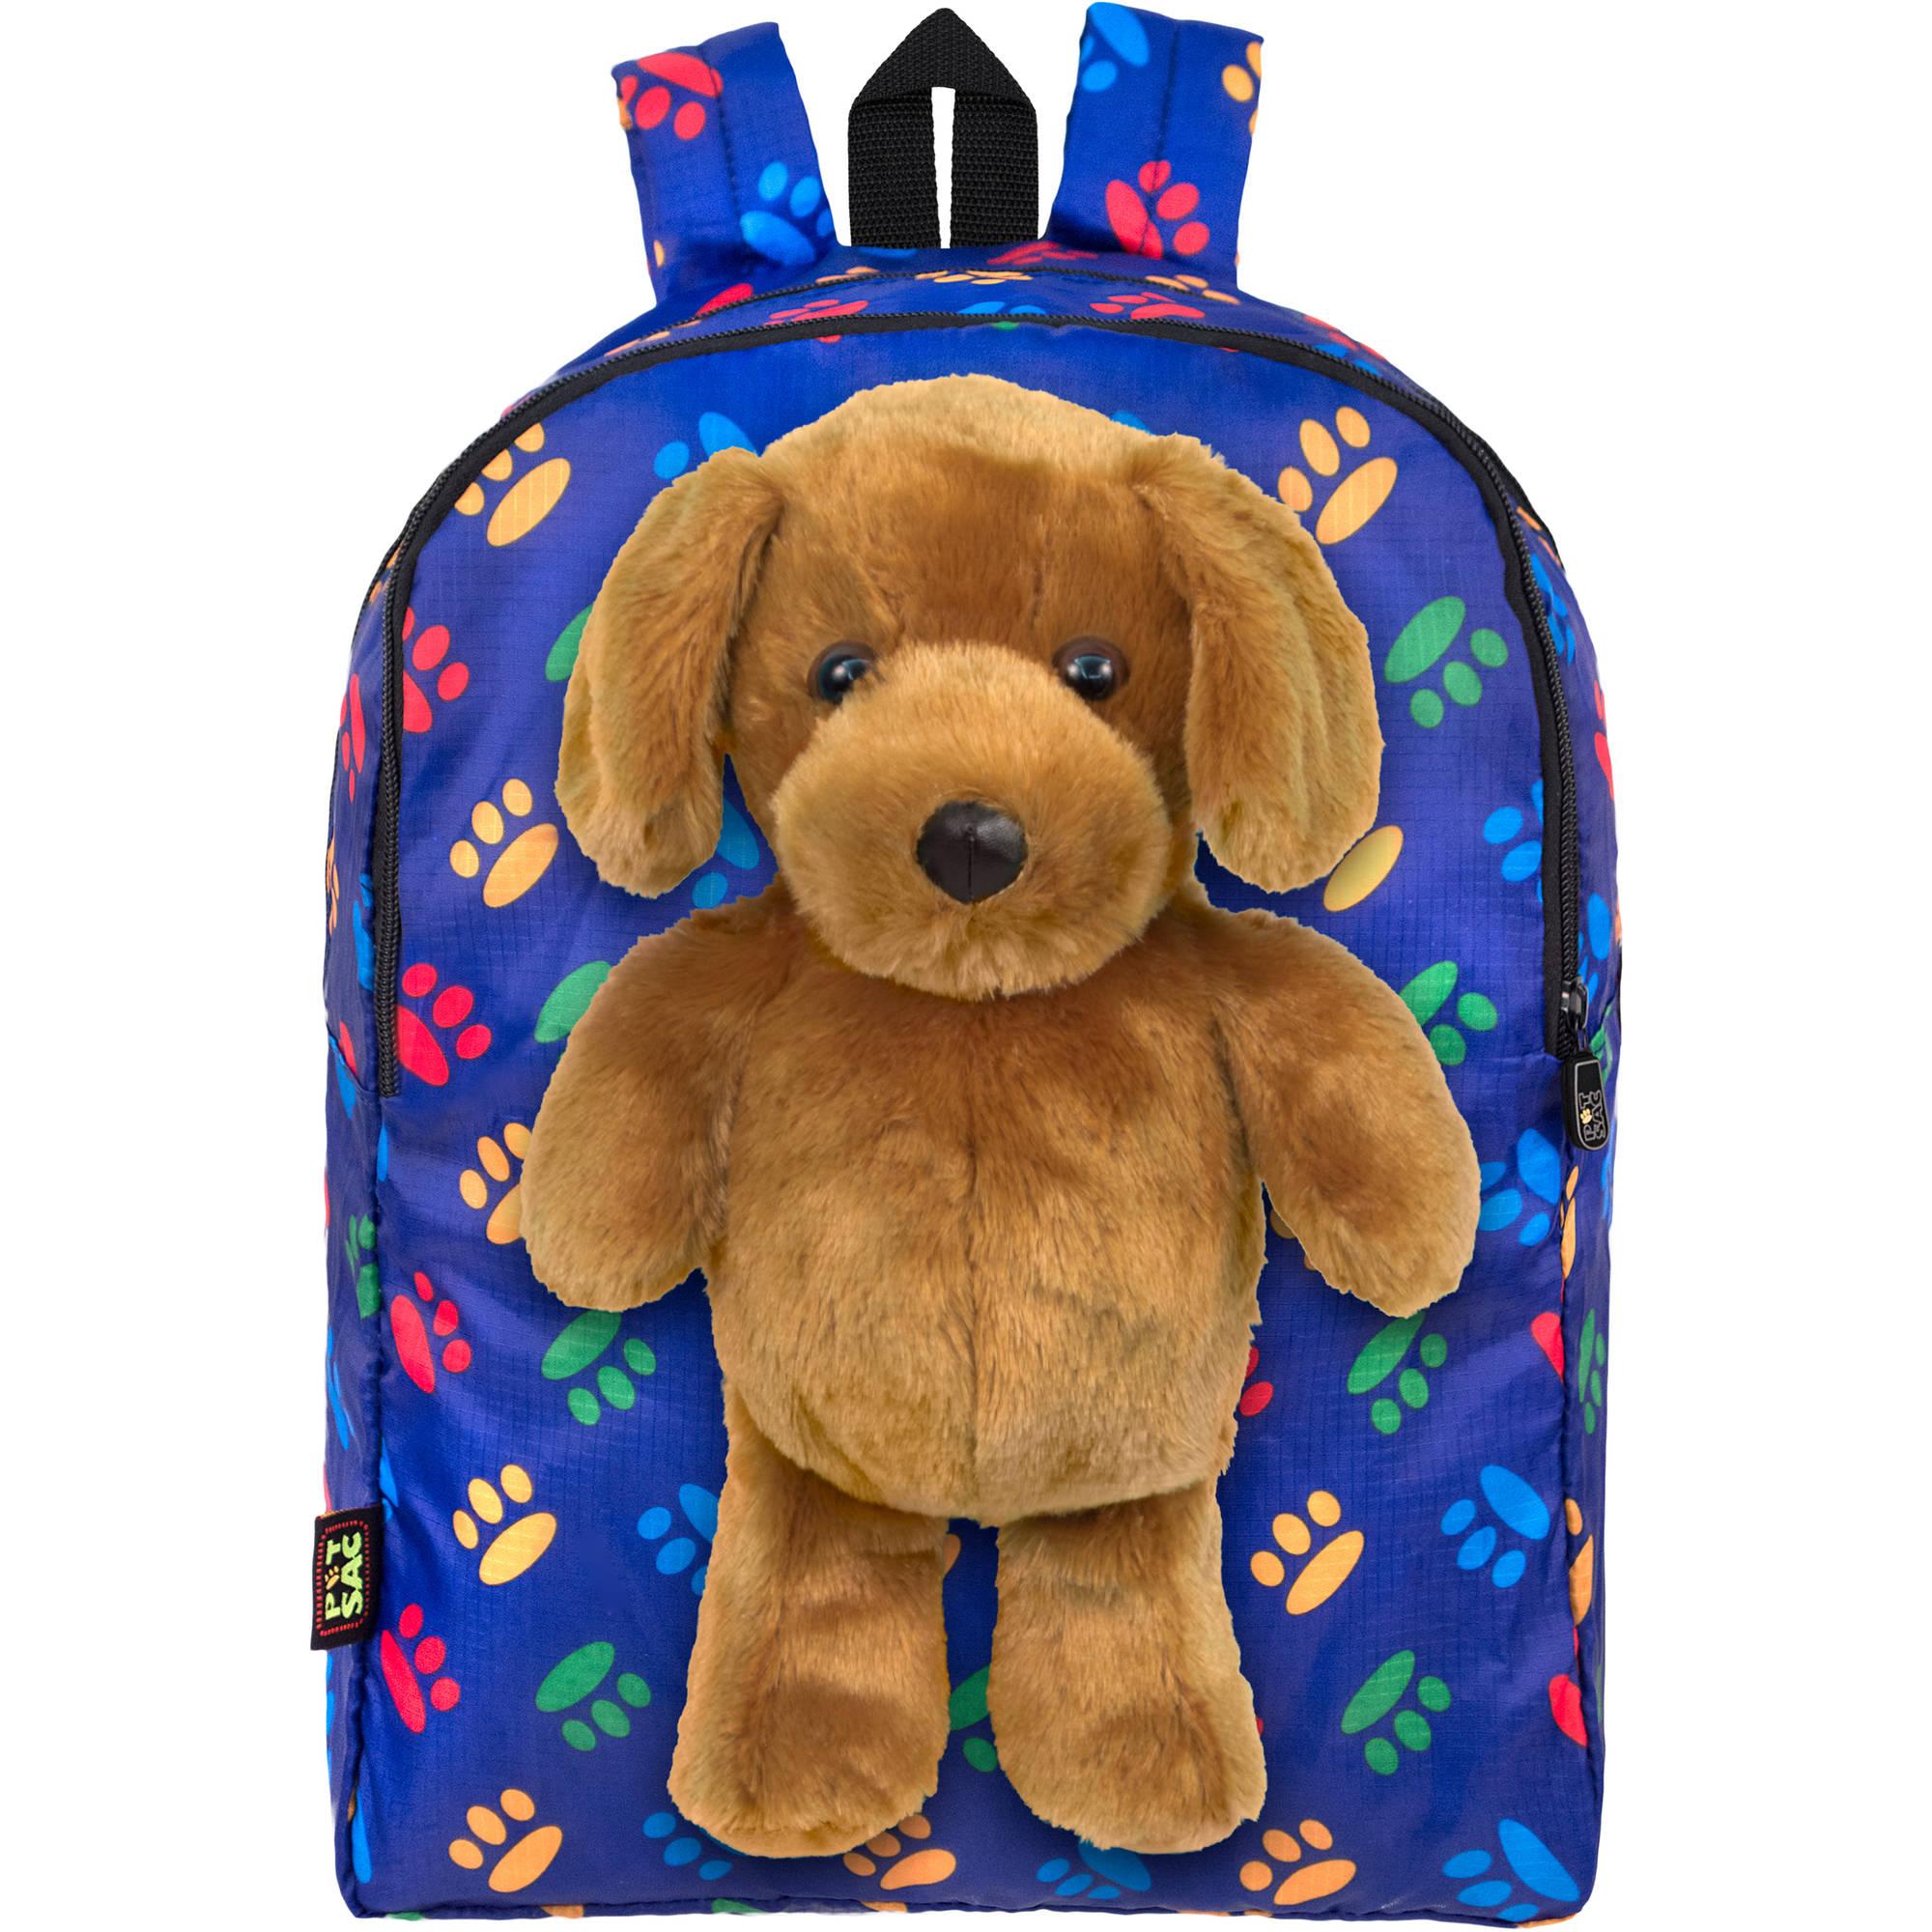 PetSac Buddy the Dog with Blue Paw Printed Backpack - Walmart.com